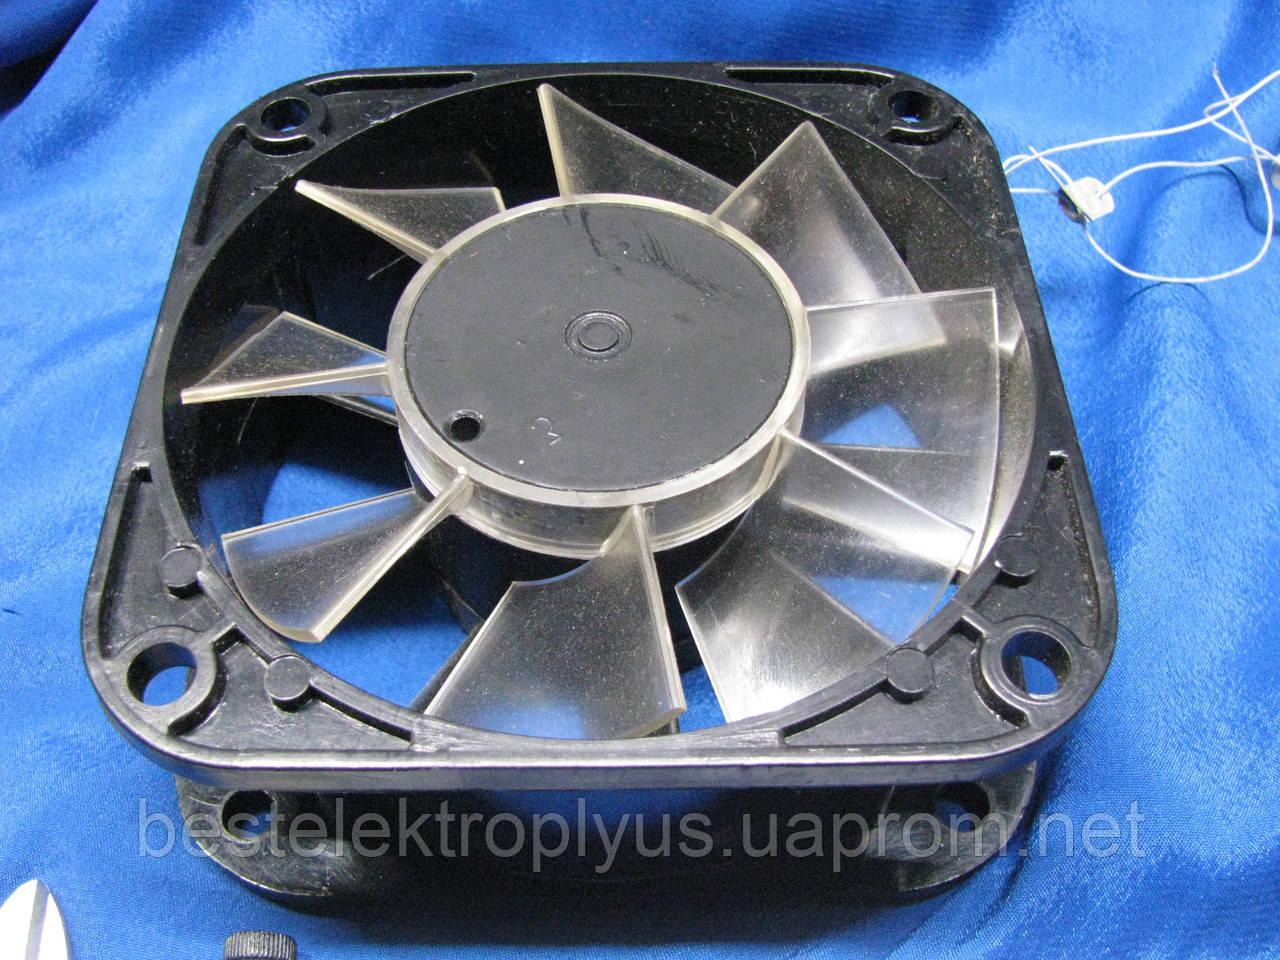 Вентилятор 1,0 ЭВ-1.4-4-3270 У4